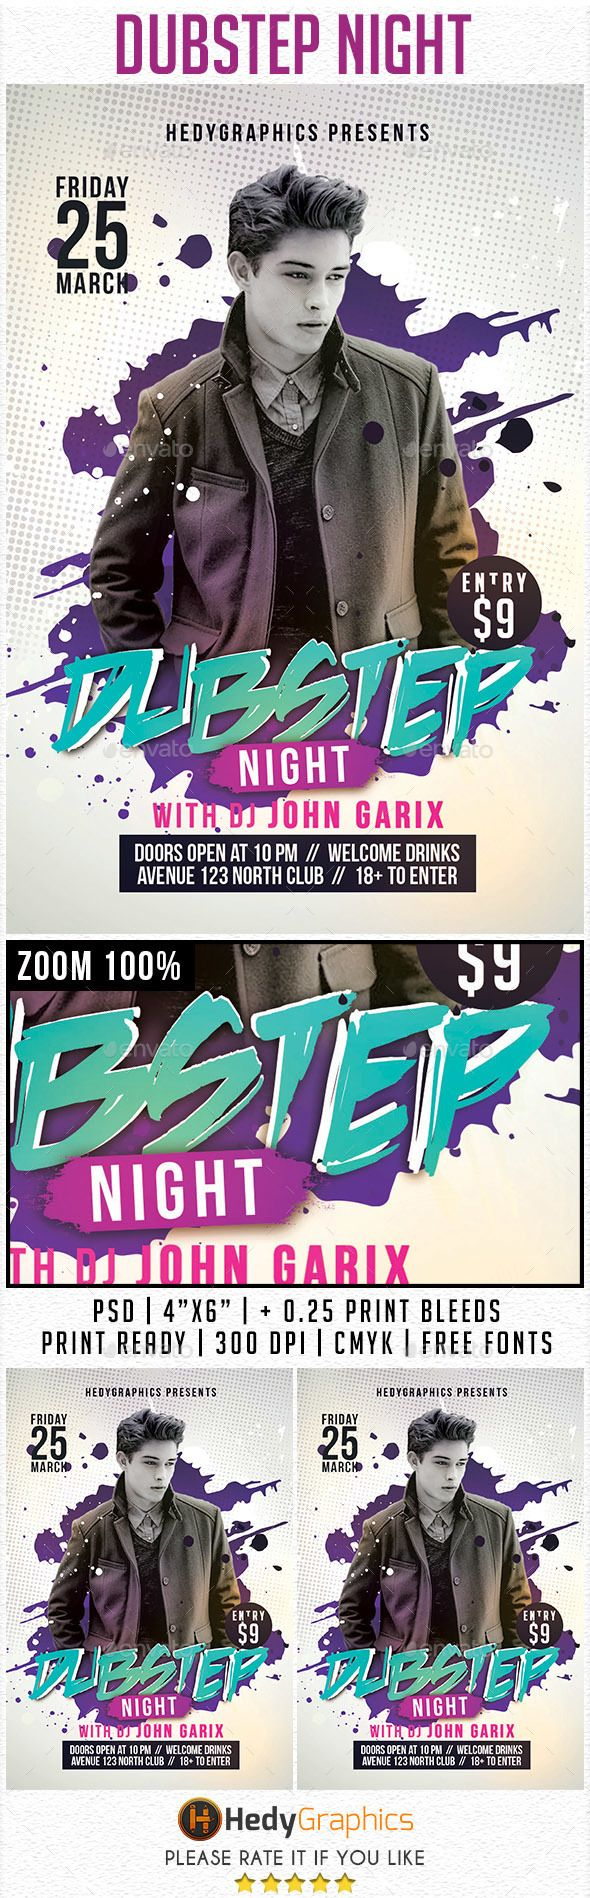 Dubstep & Guest Dj - Flyer Template PSD #design Download: http://graphicriver.net/item/dubstep-guest-dj-flyer-template/14485776?ref=ksioks